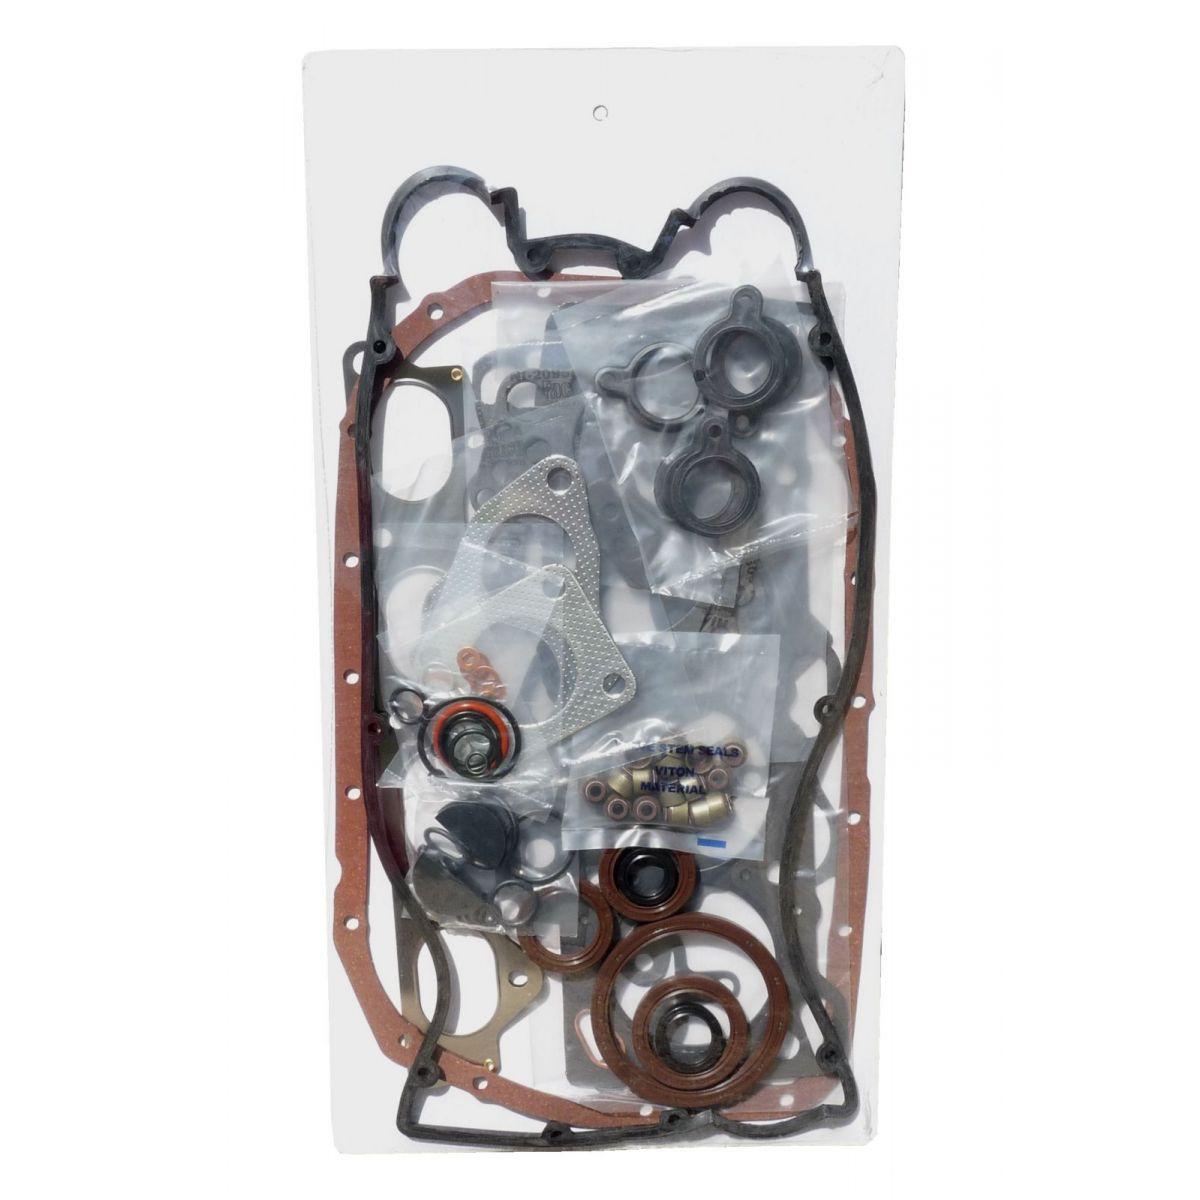 Complete Engine Gasket Set Kit For Eclipse Talon TSI 2.0L DOHC